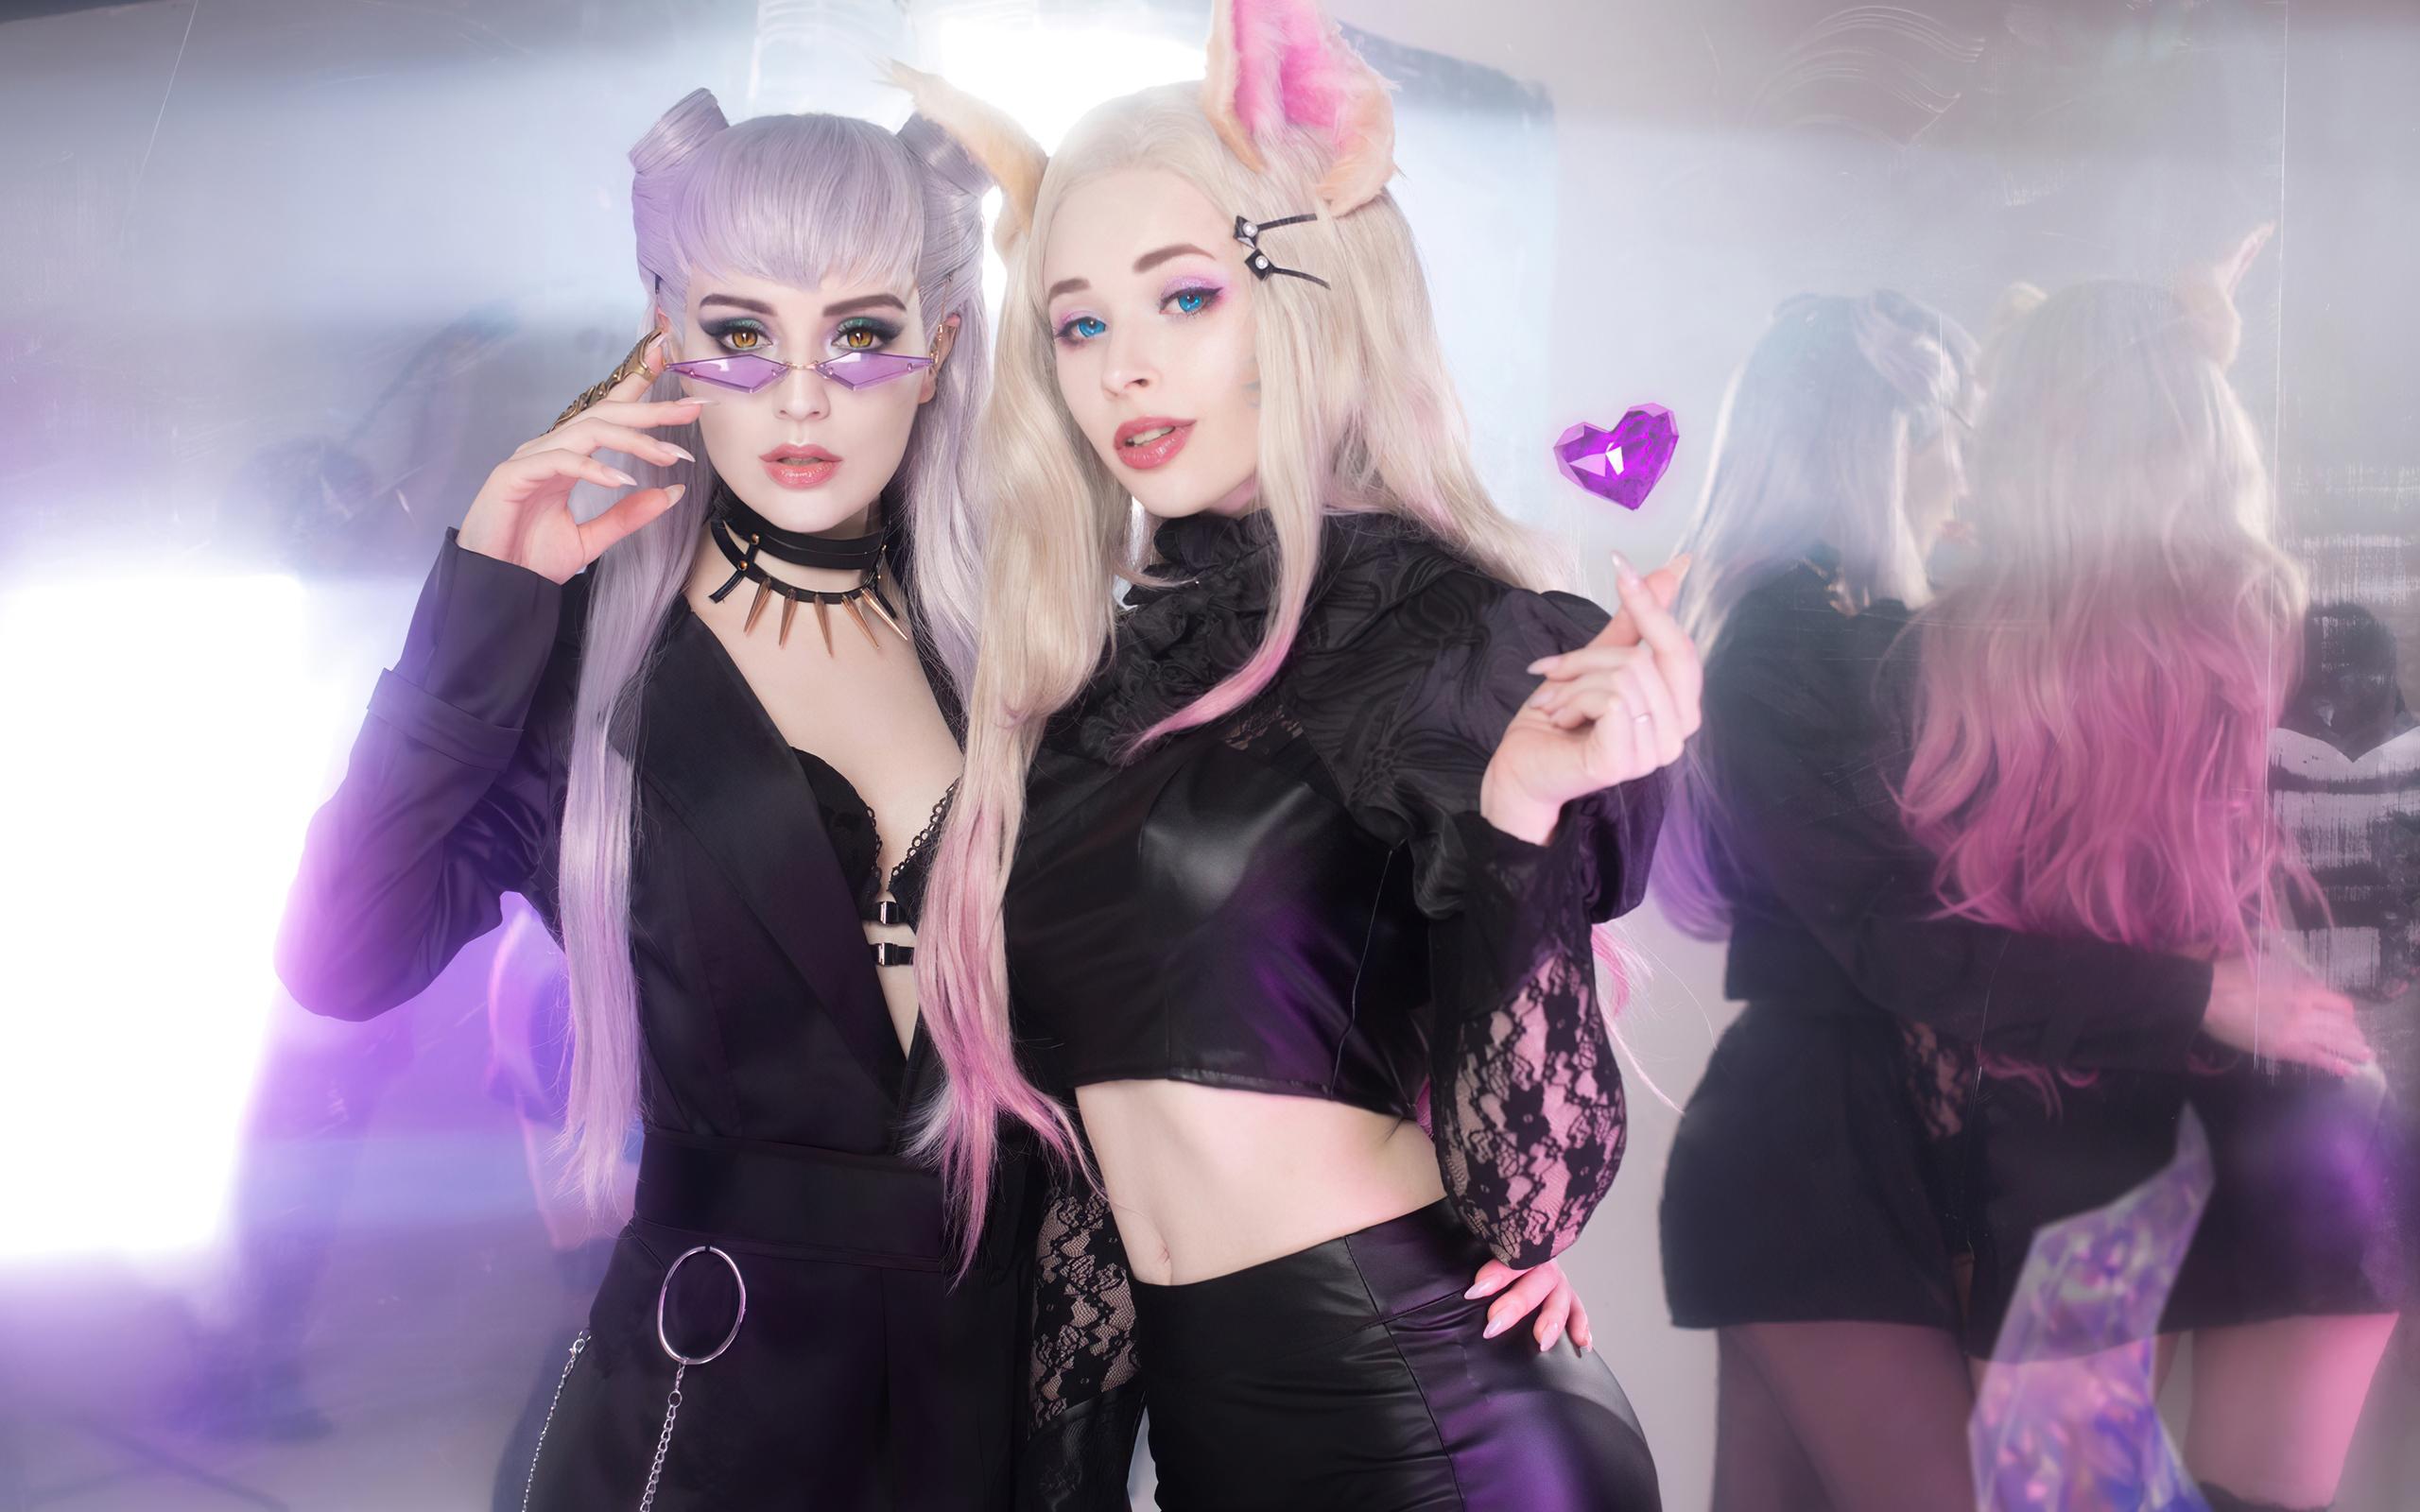 evelynn-and-ahri-cosplay-dl.jpg